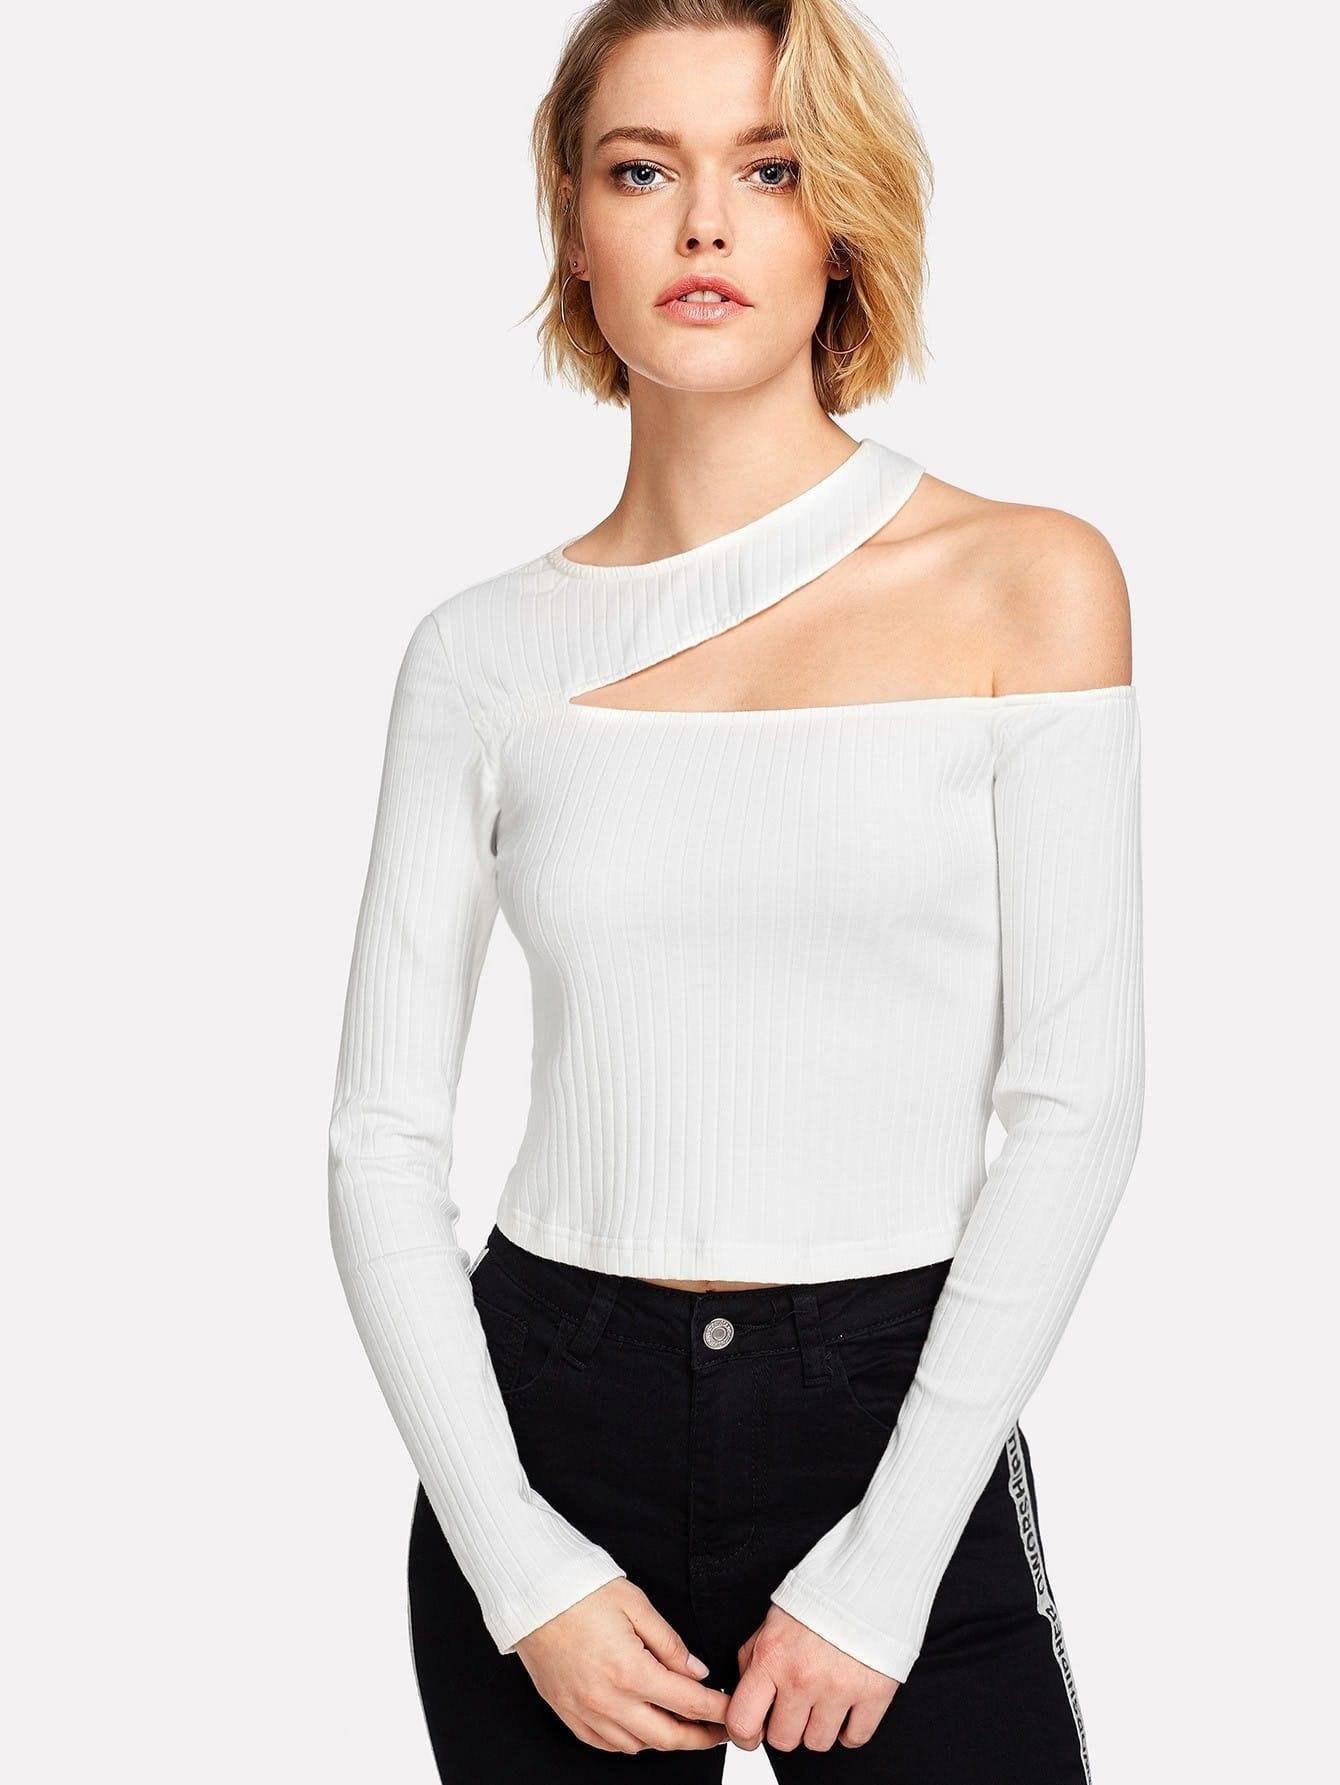 Asymmetric Cutout Rib Knit Tee cutout front rib knit t shirt